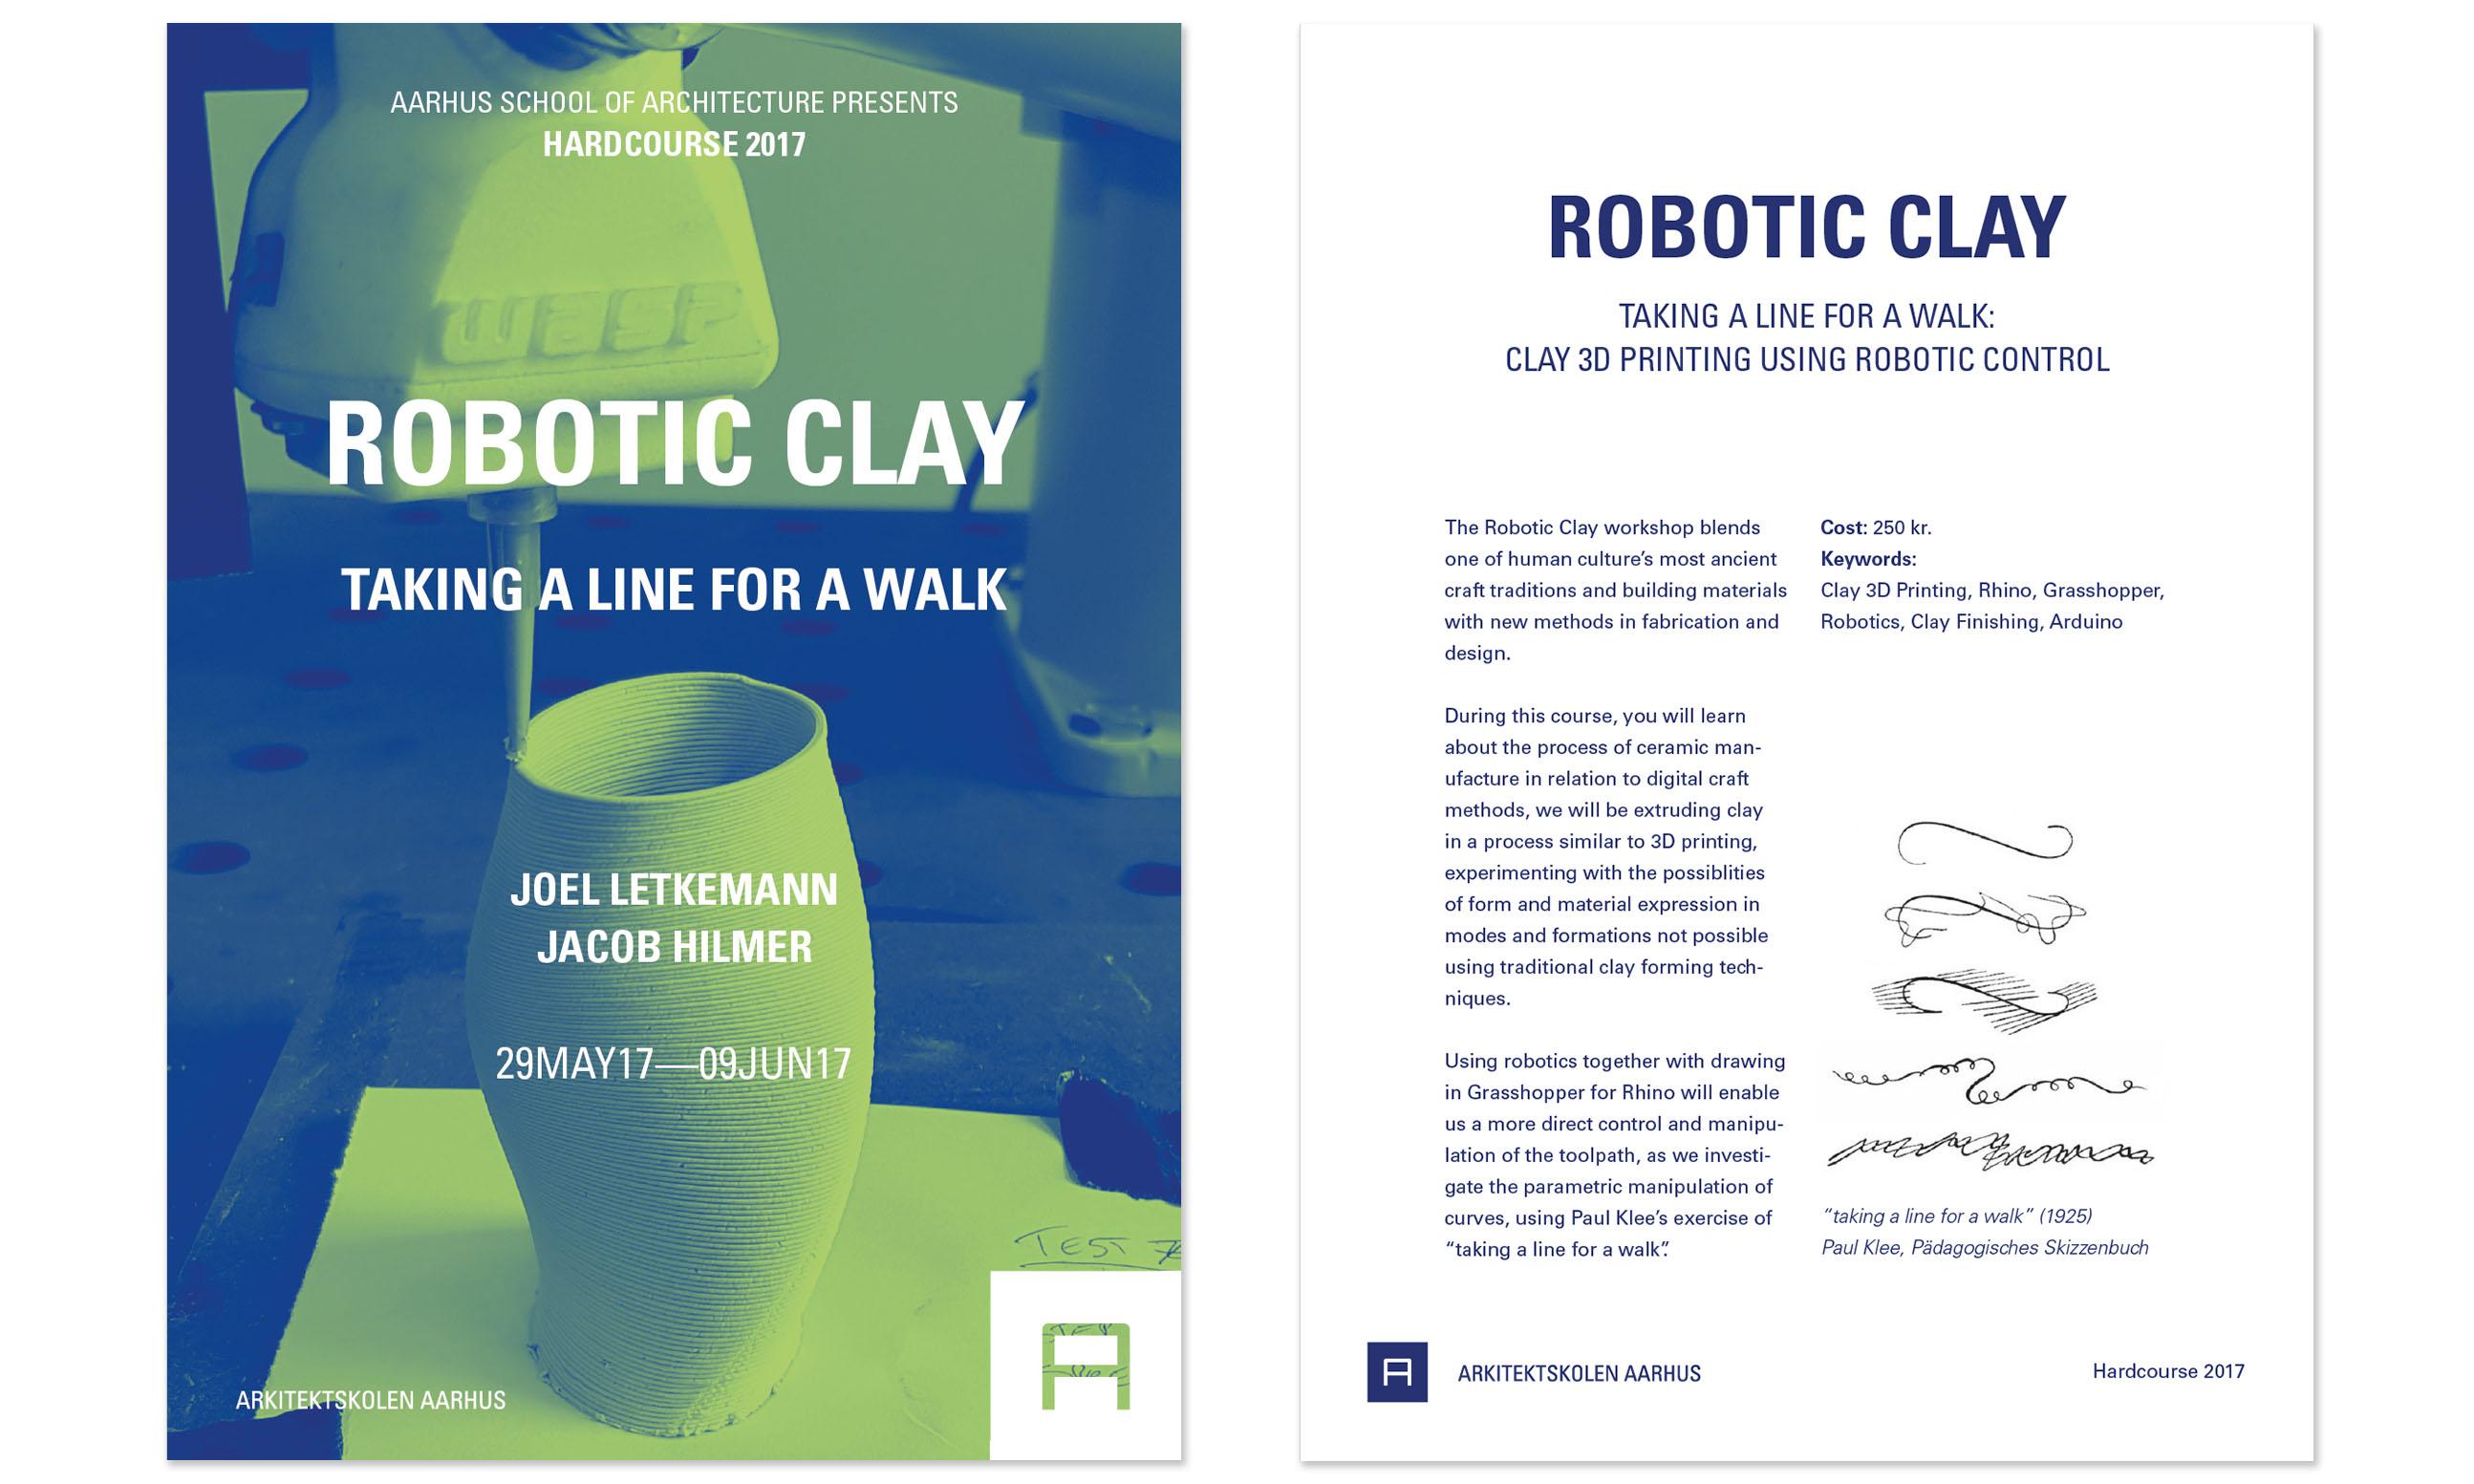 Robotic Clay Hardcourse 2017